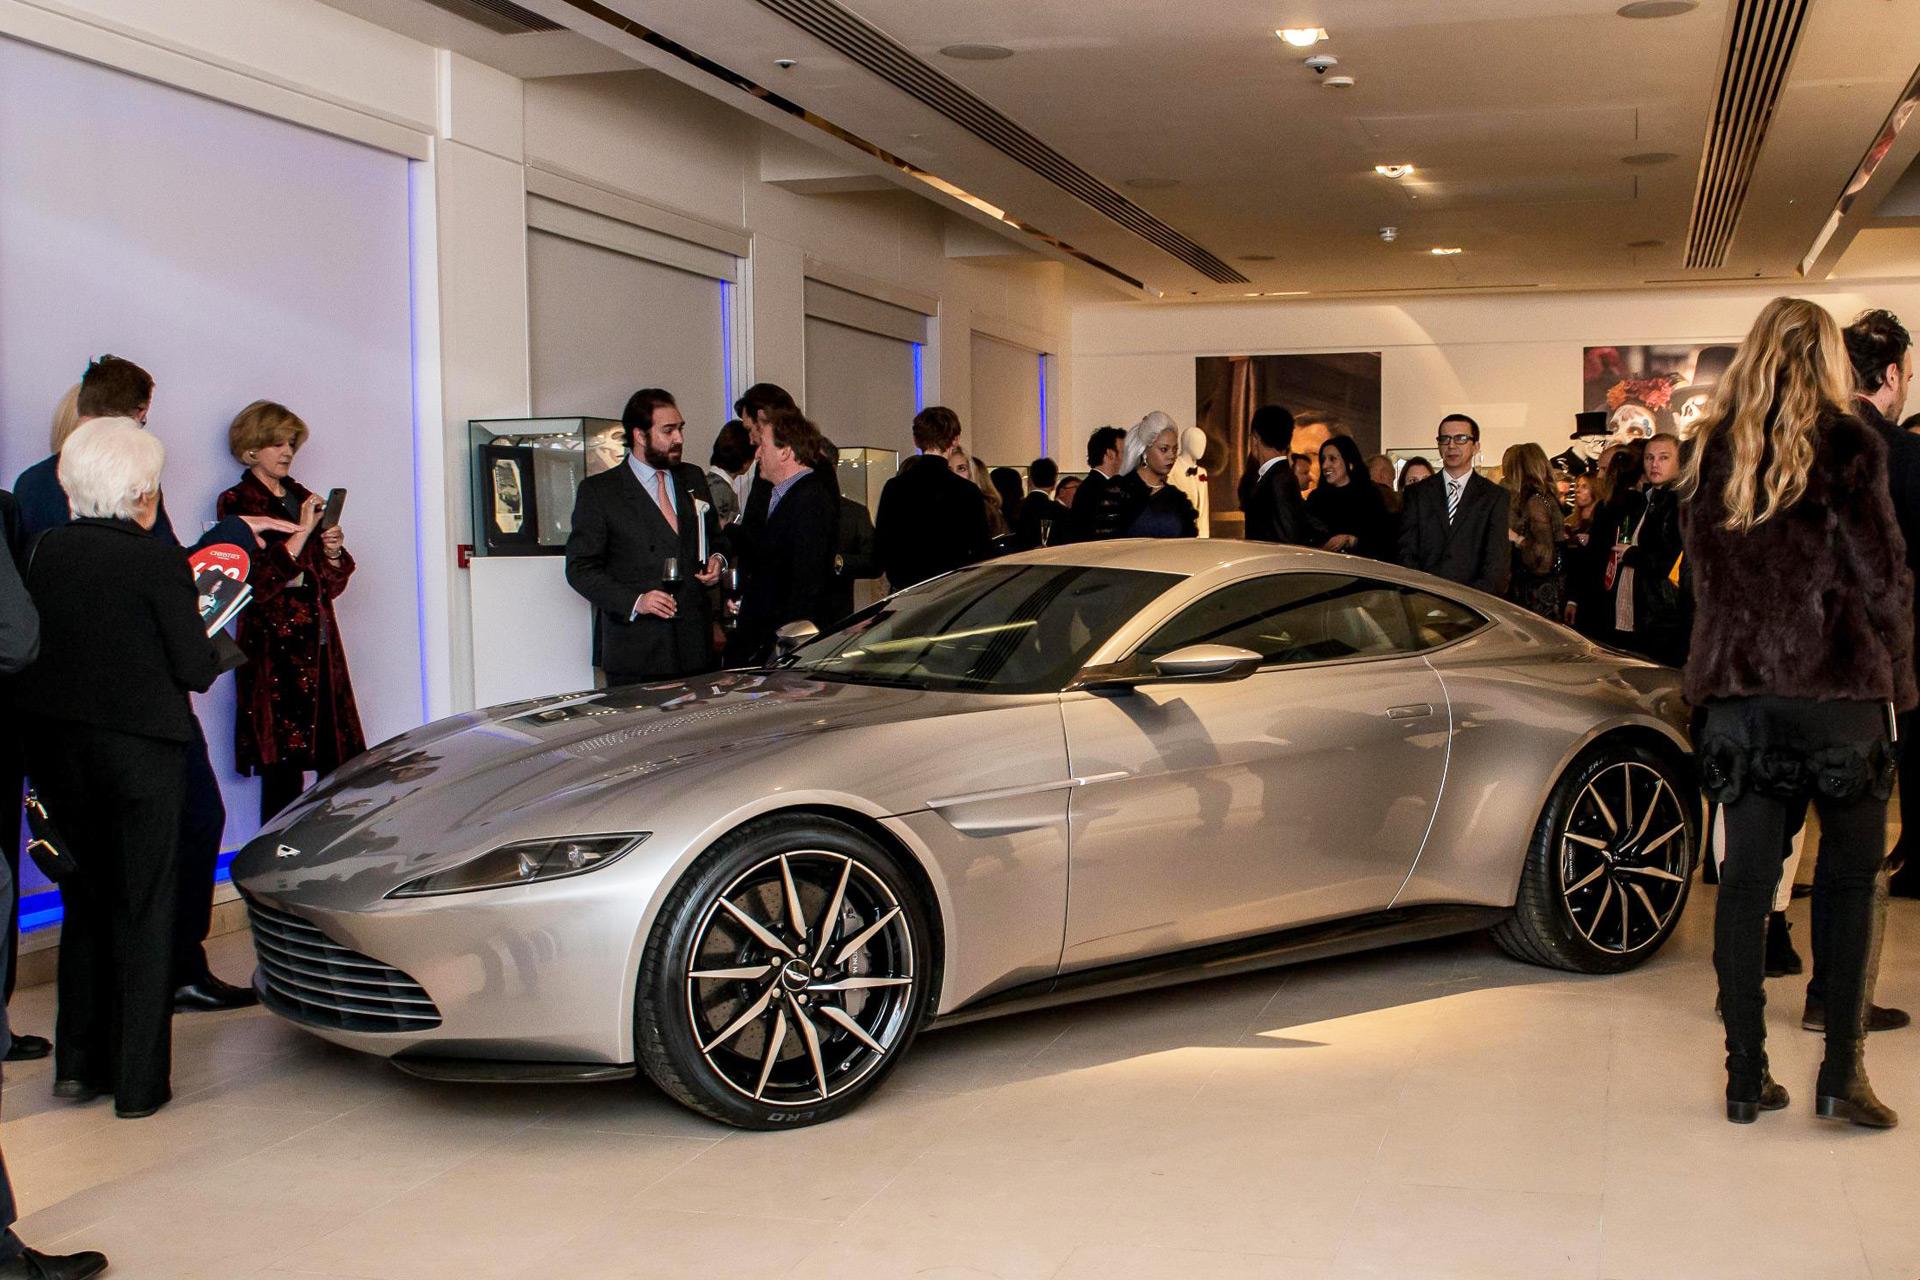 Mystery Buyer Bids 3 5 Million For Aston Martin Db10